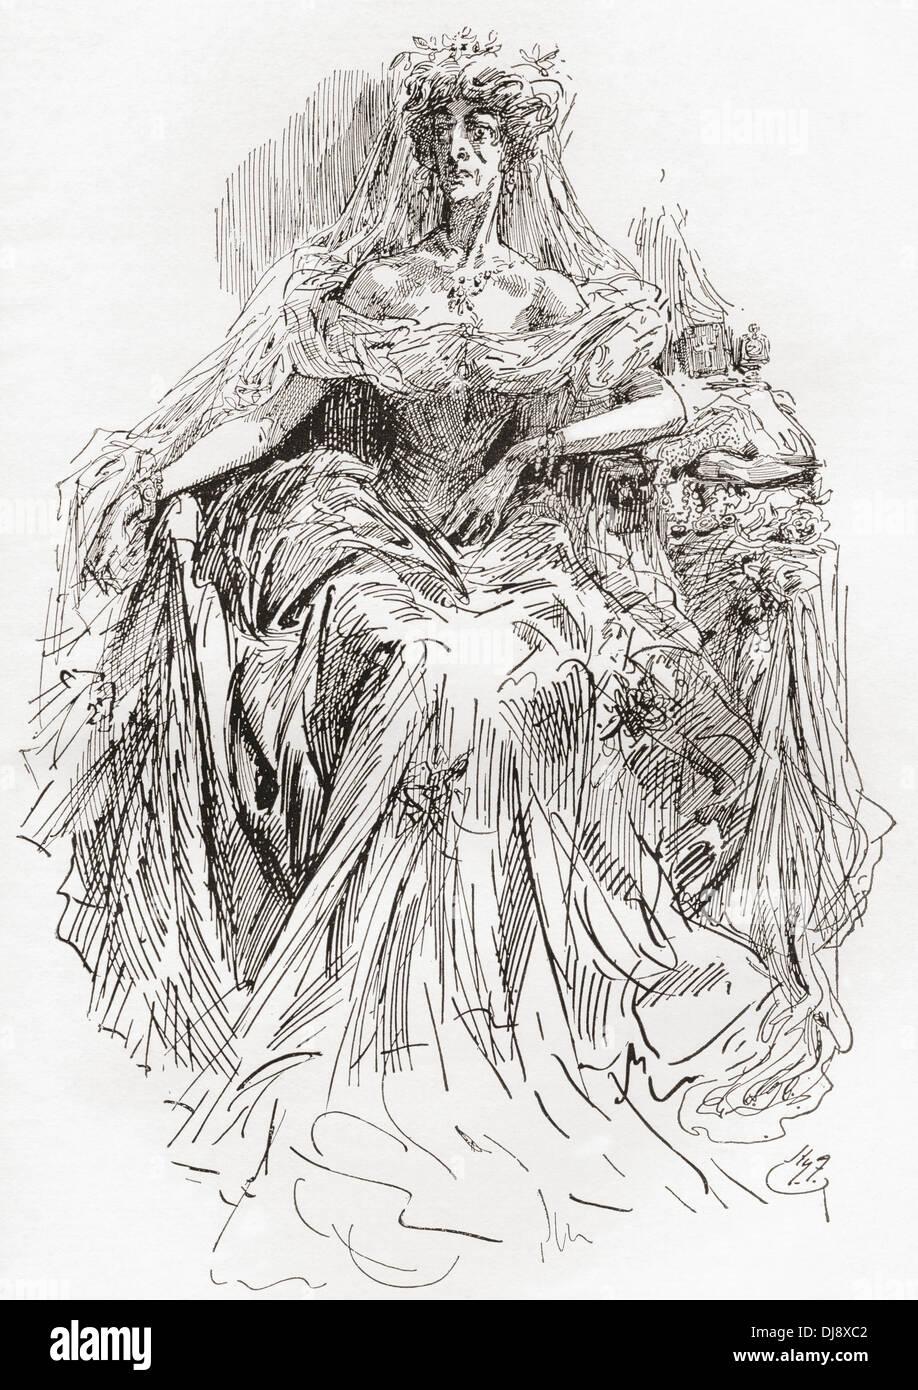 Miss Havisham. Illustration by Harry Furniss from the ...